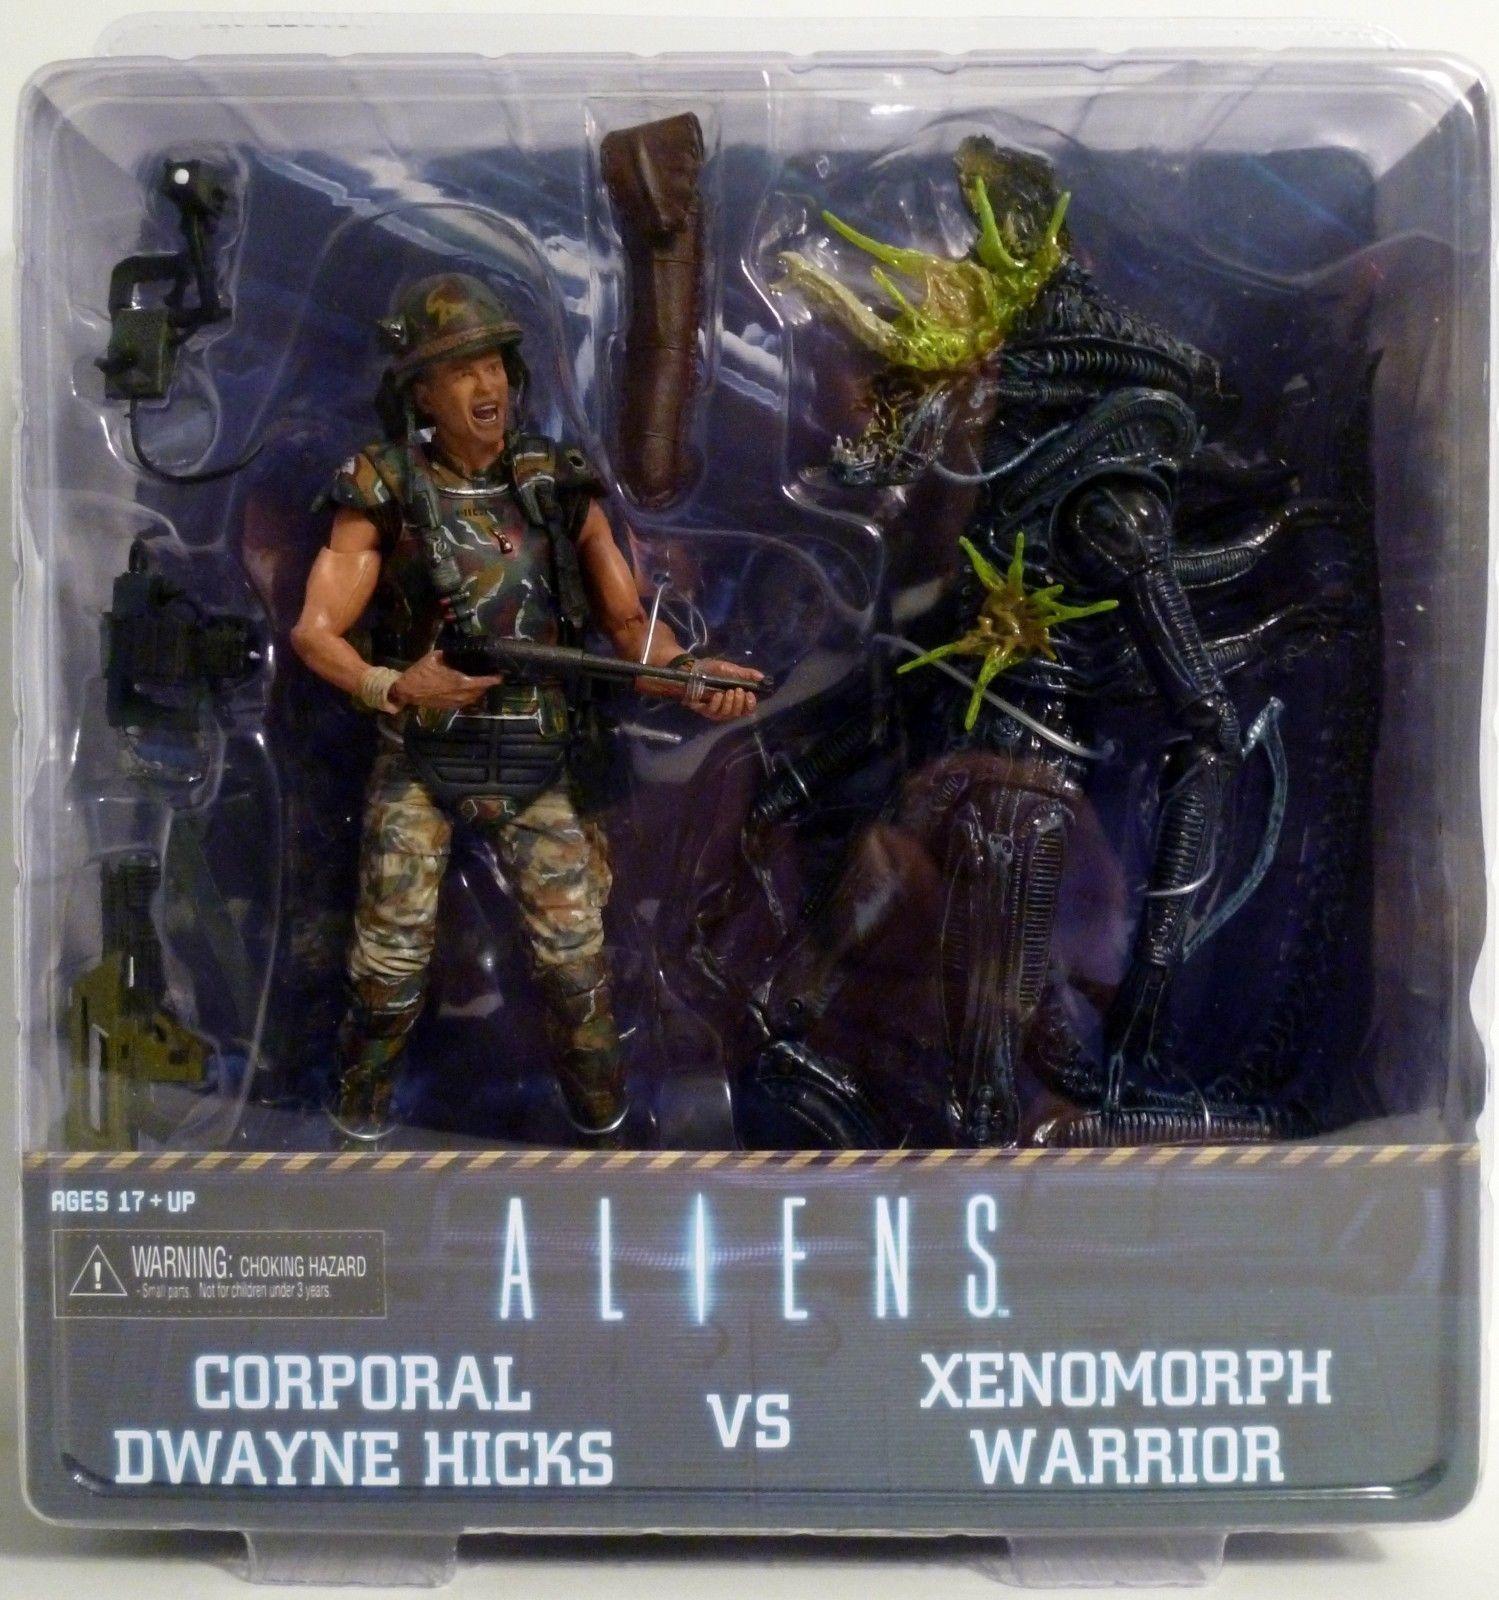 NECA Aliens Corporal Dwayne Hicks VS Xenomorph Warrior Statue Action Figures Toy Anime Figure Collectible Model Toy elsadou toy story 3 aliens action figures 22cm action